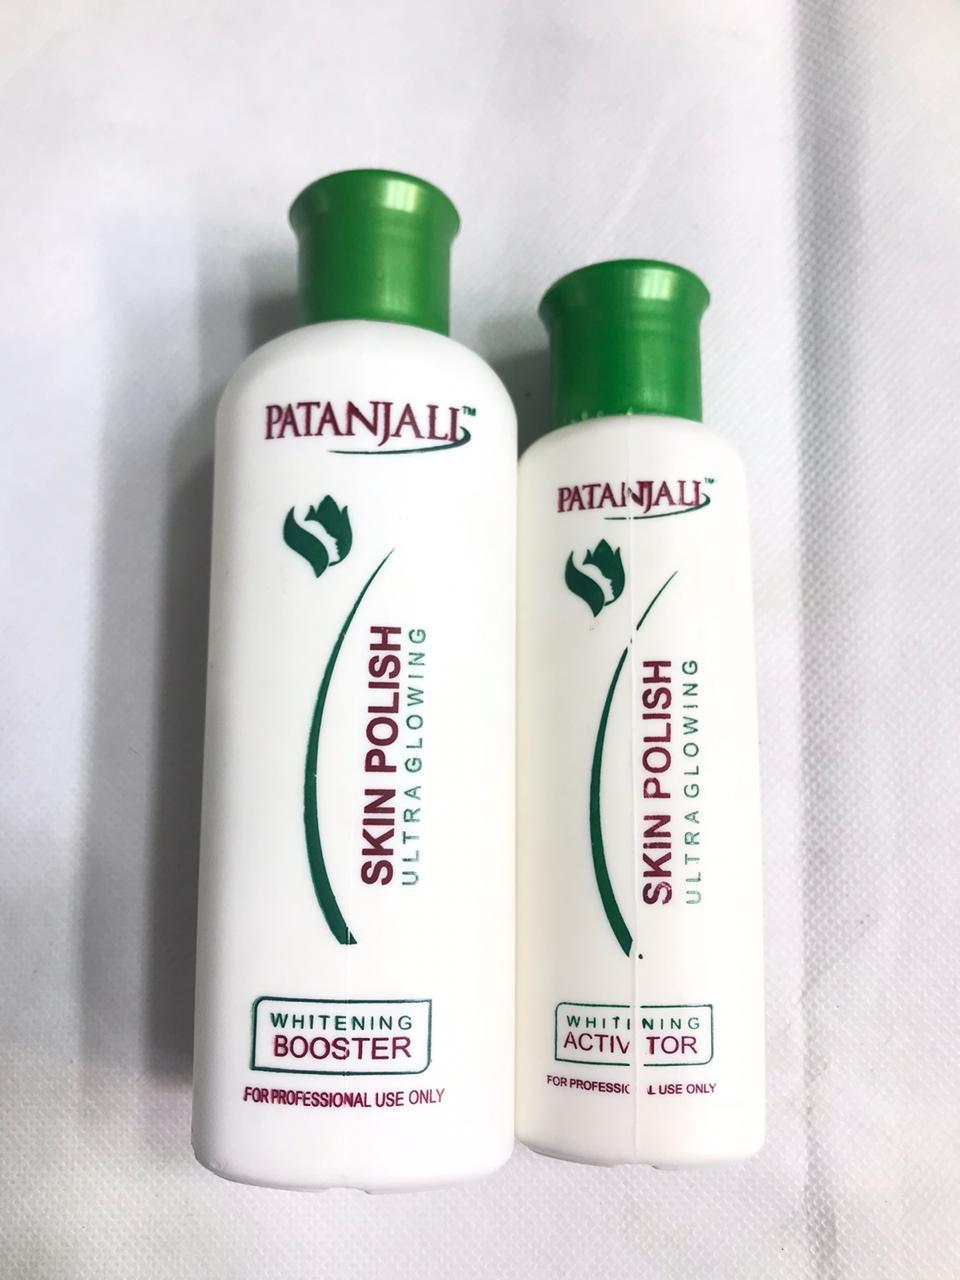 Patanjali Ultra Glowing Skin Polish High Quality Skin Polish Whitening Booster And Activator